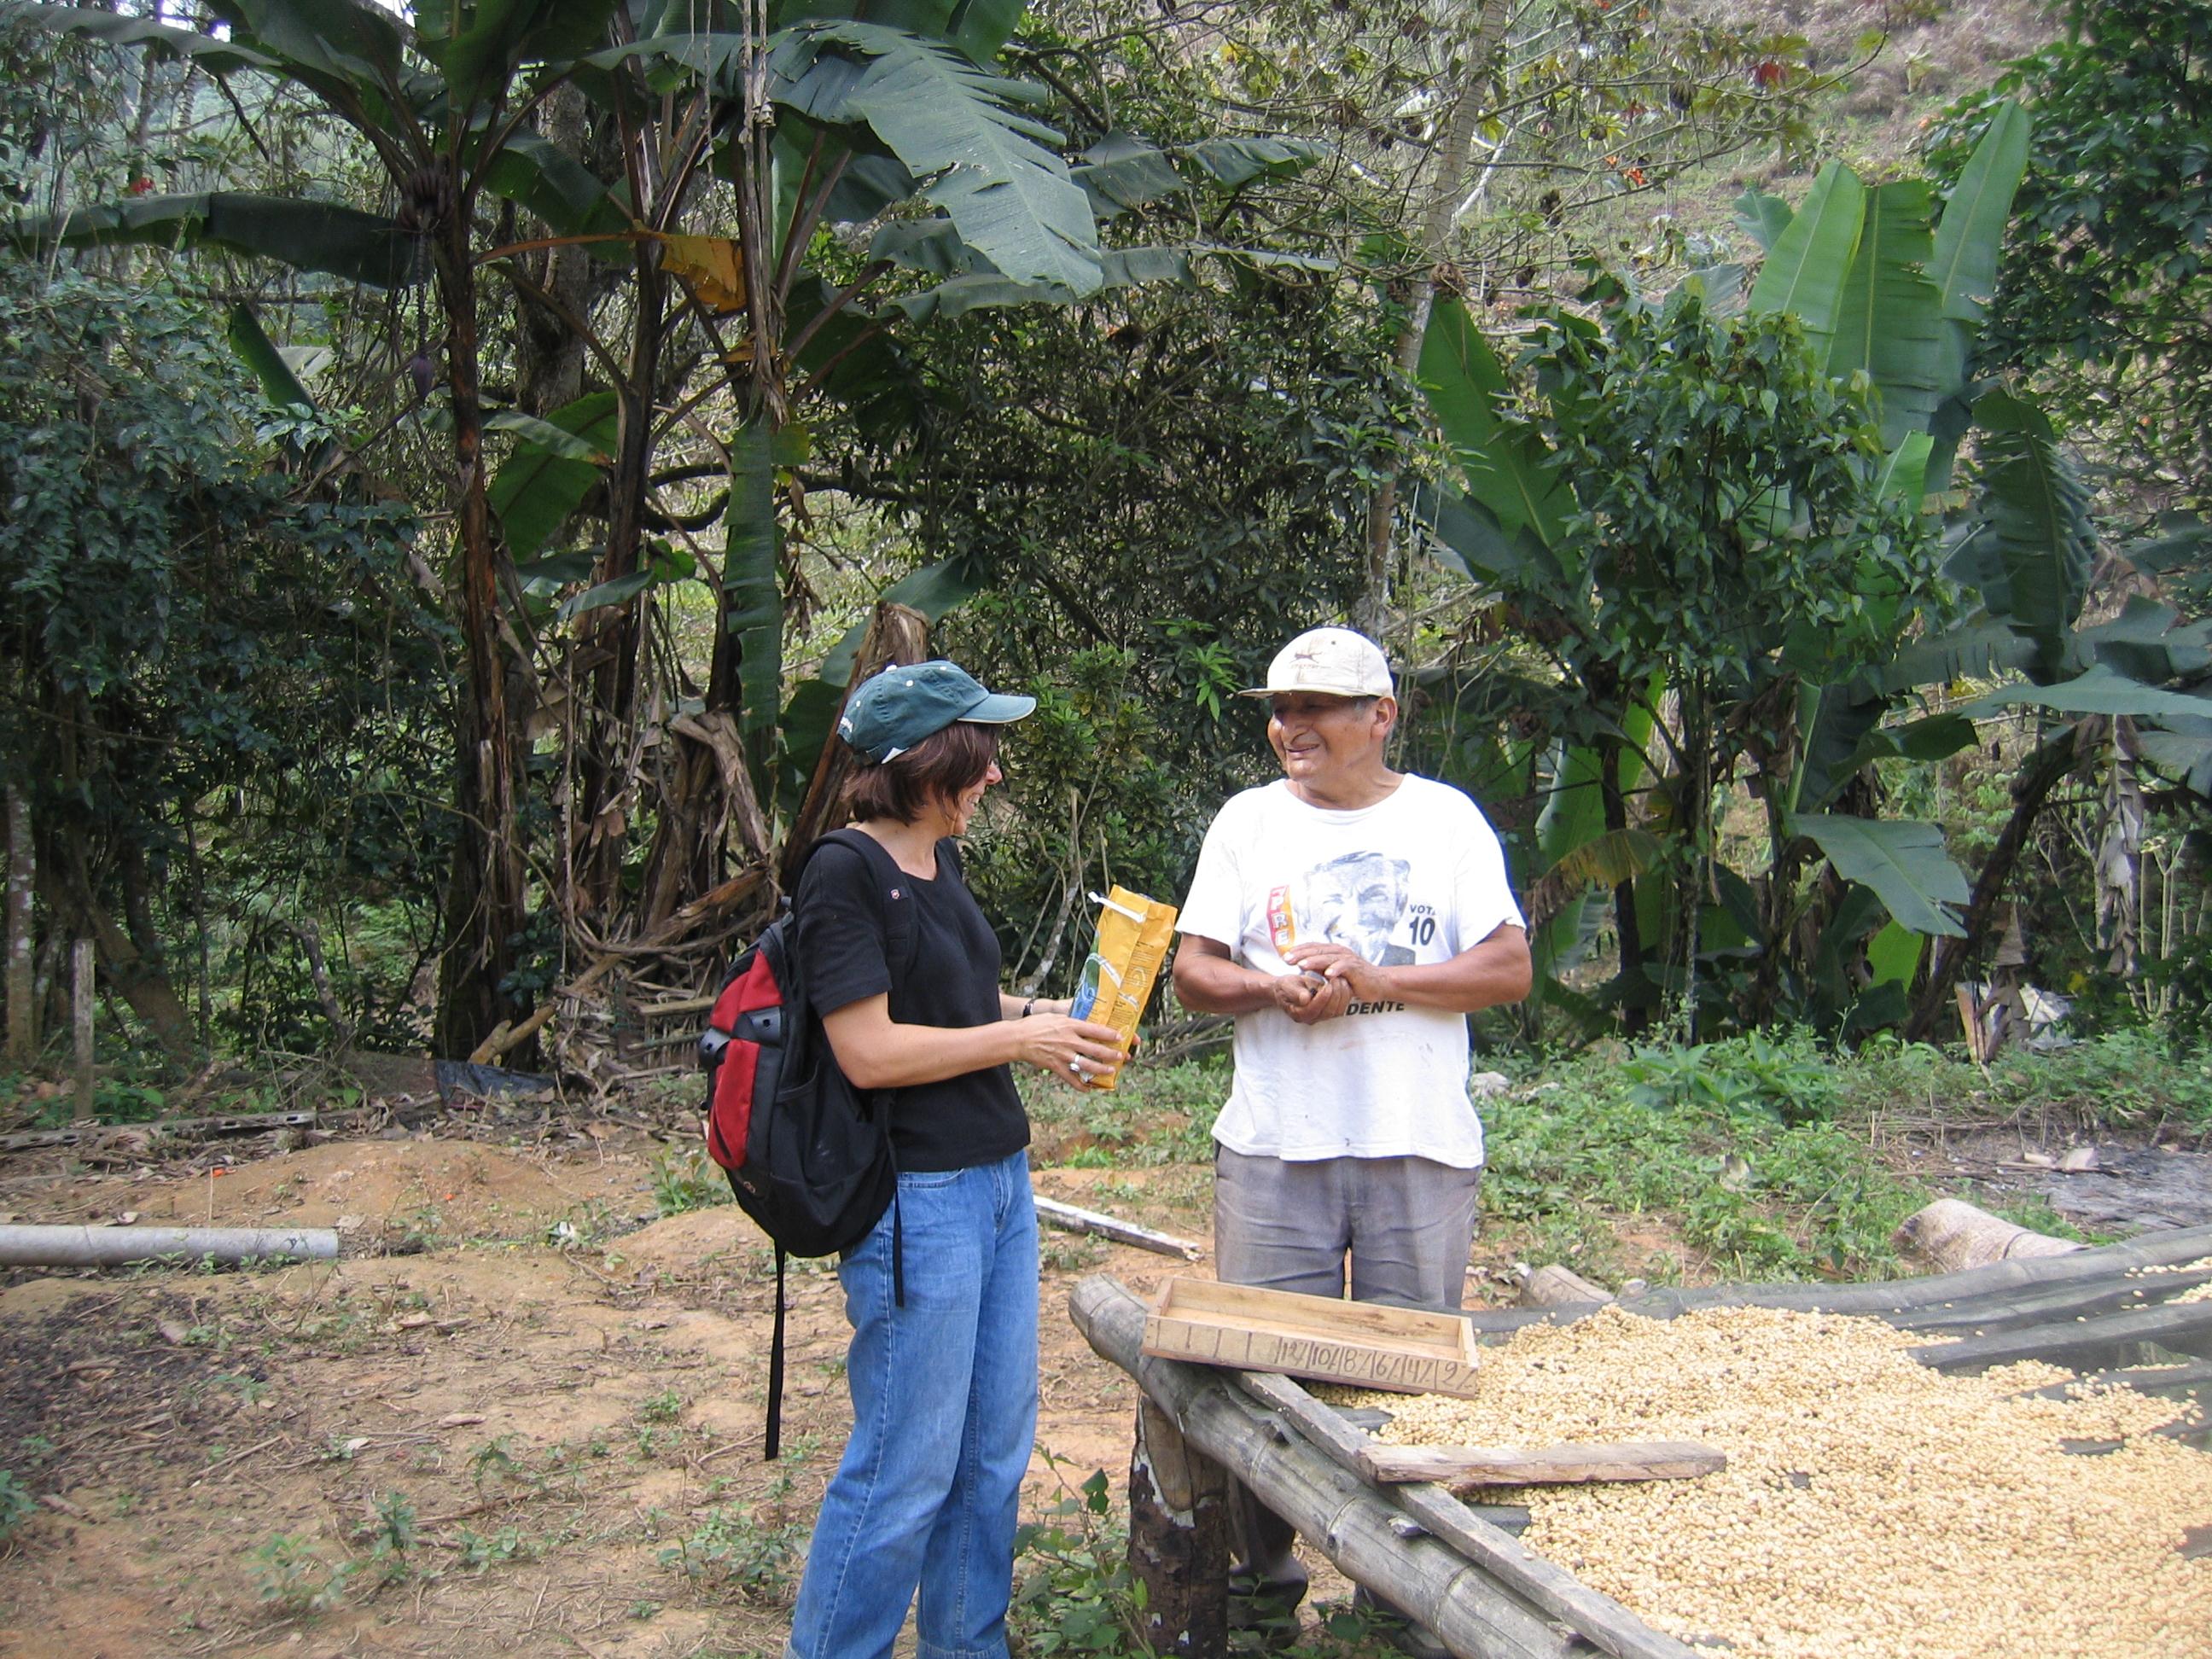 Talking with an APECAM producer, Carlos Hortensio Moreno